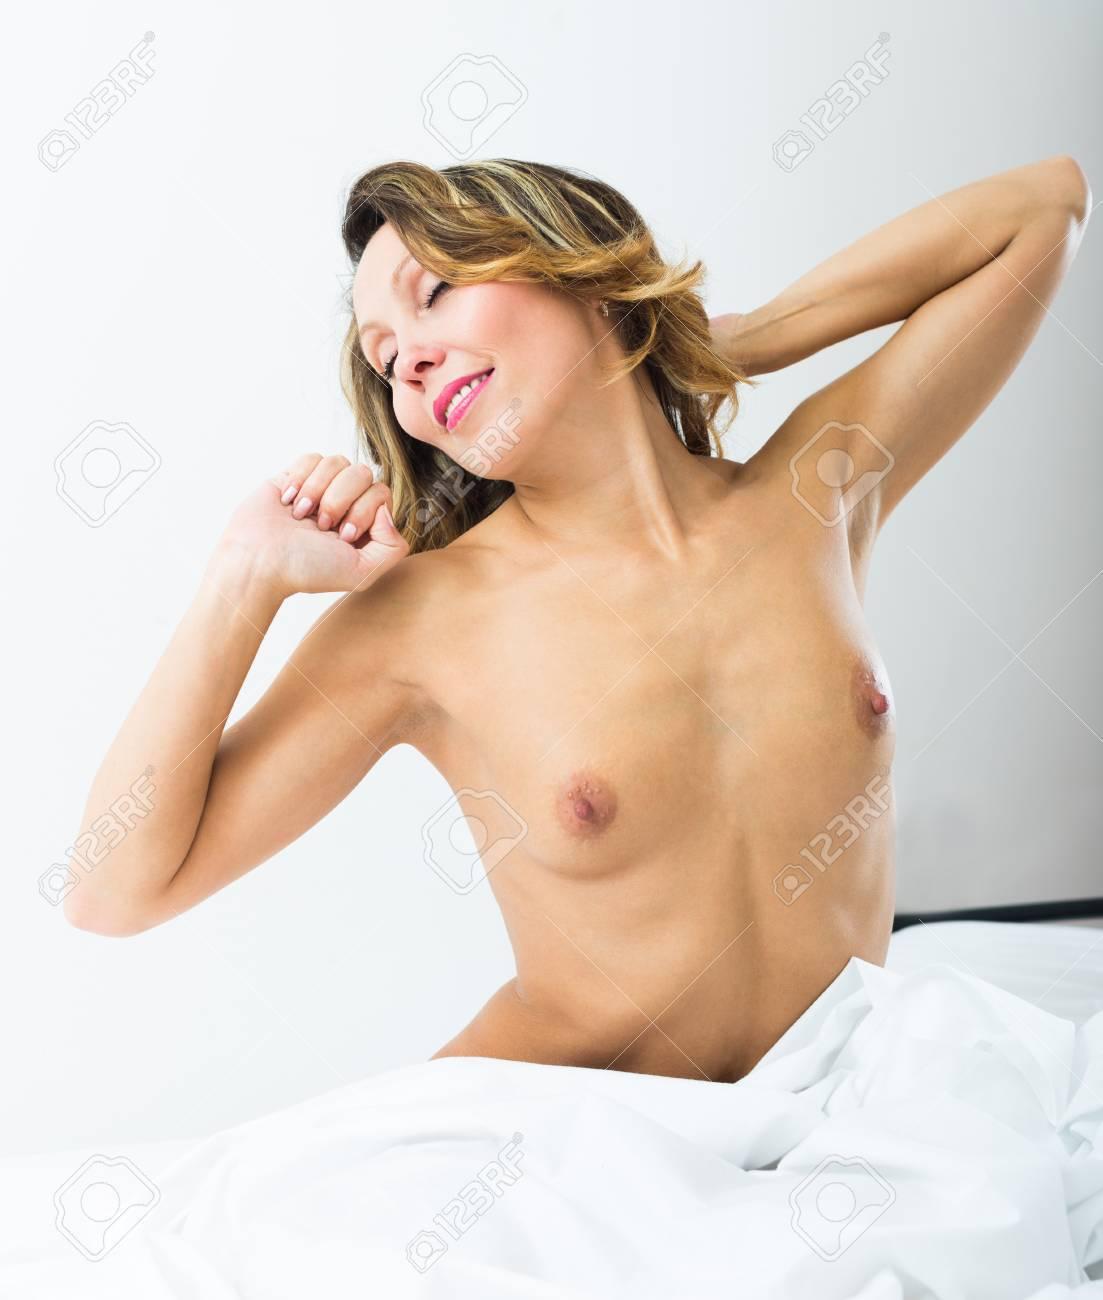 Sexy ebony upskirt